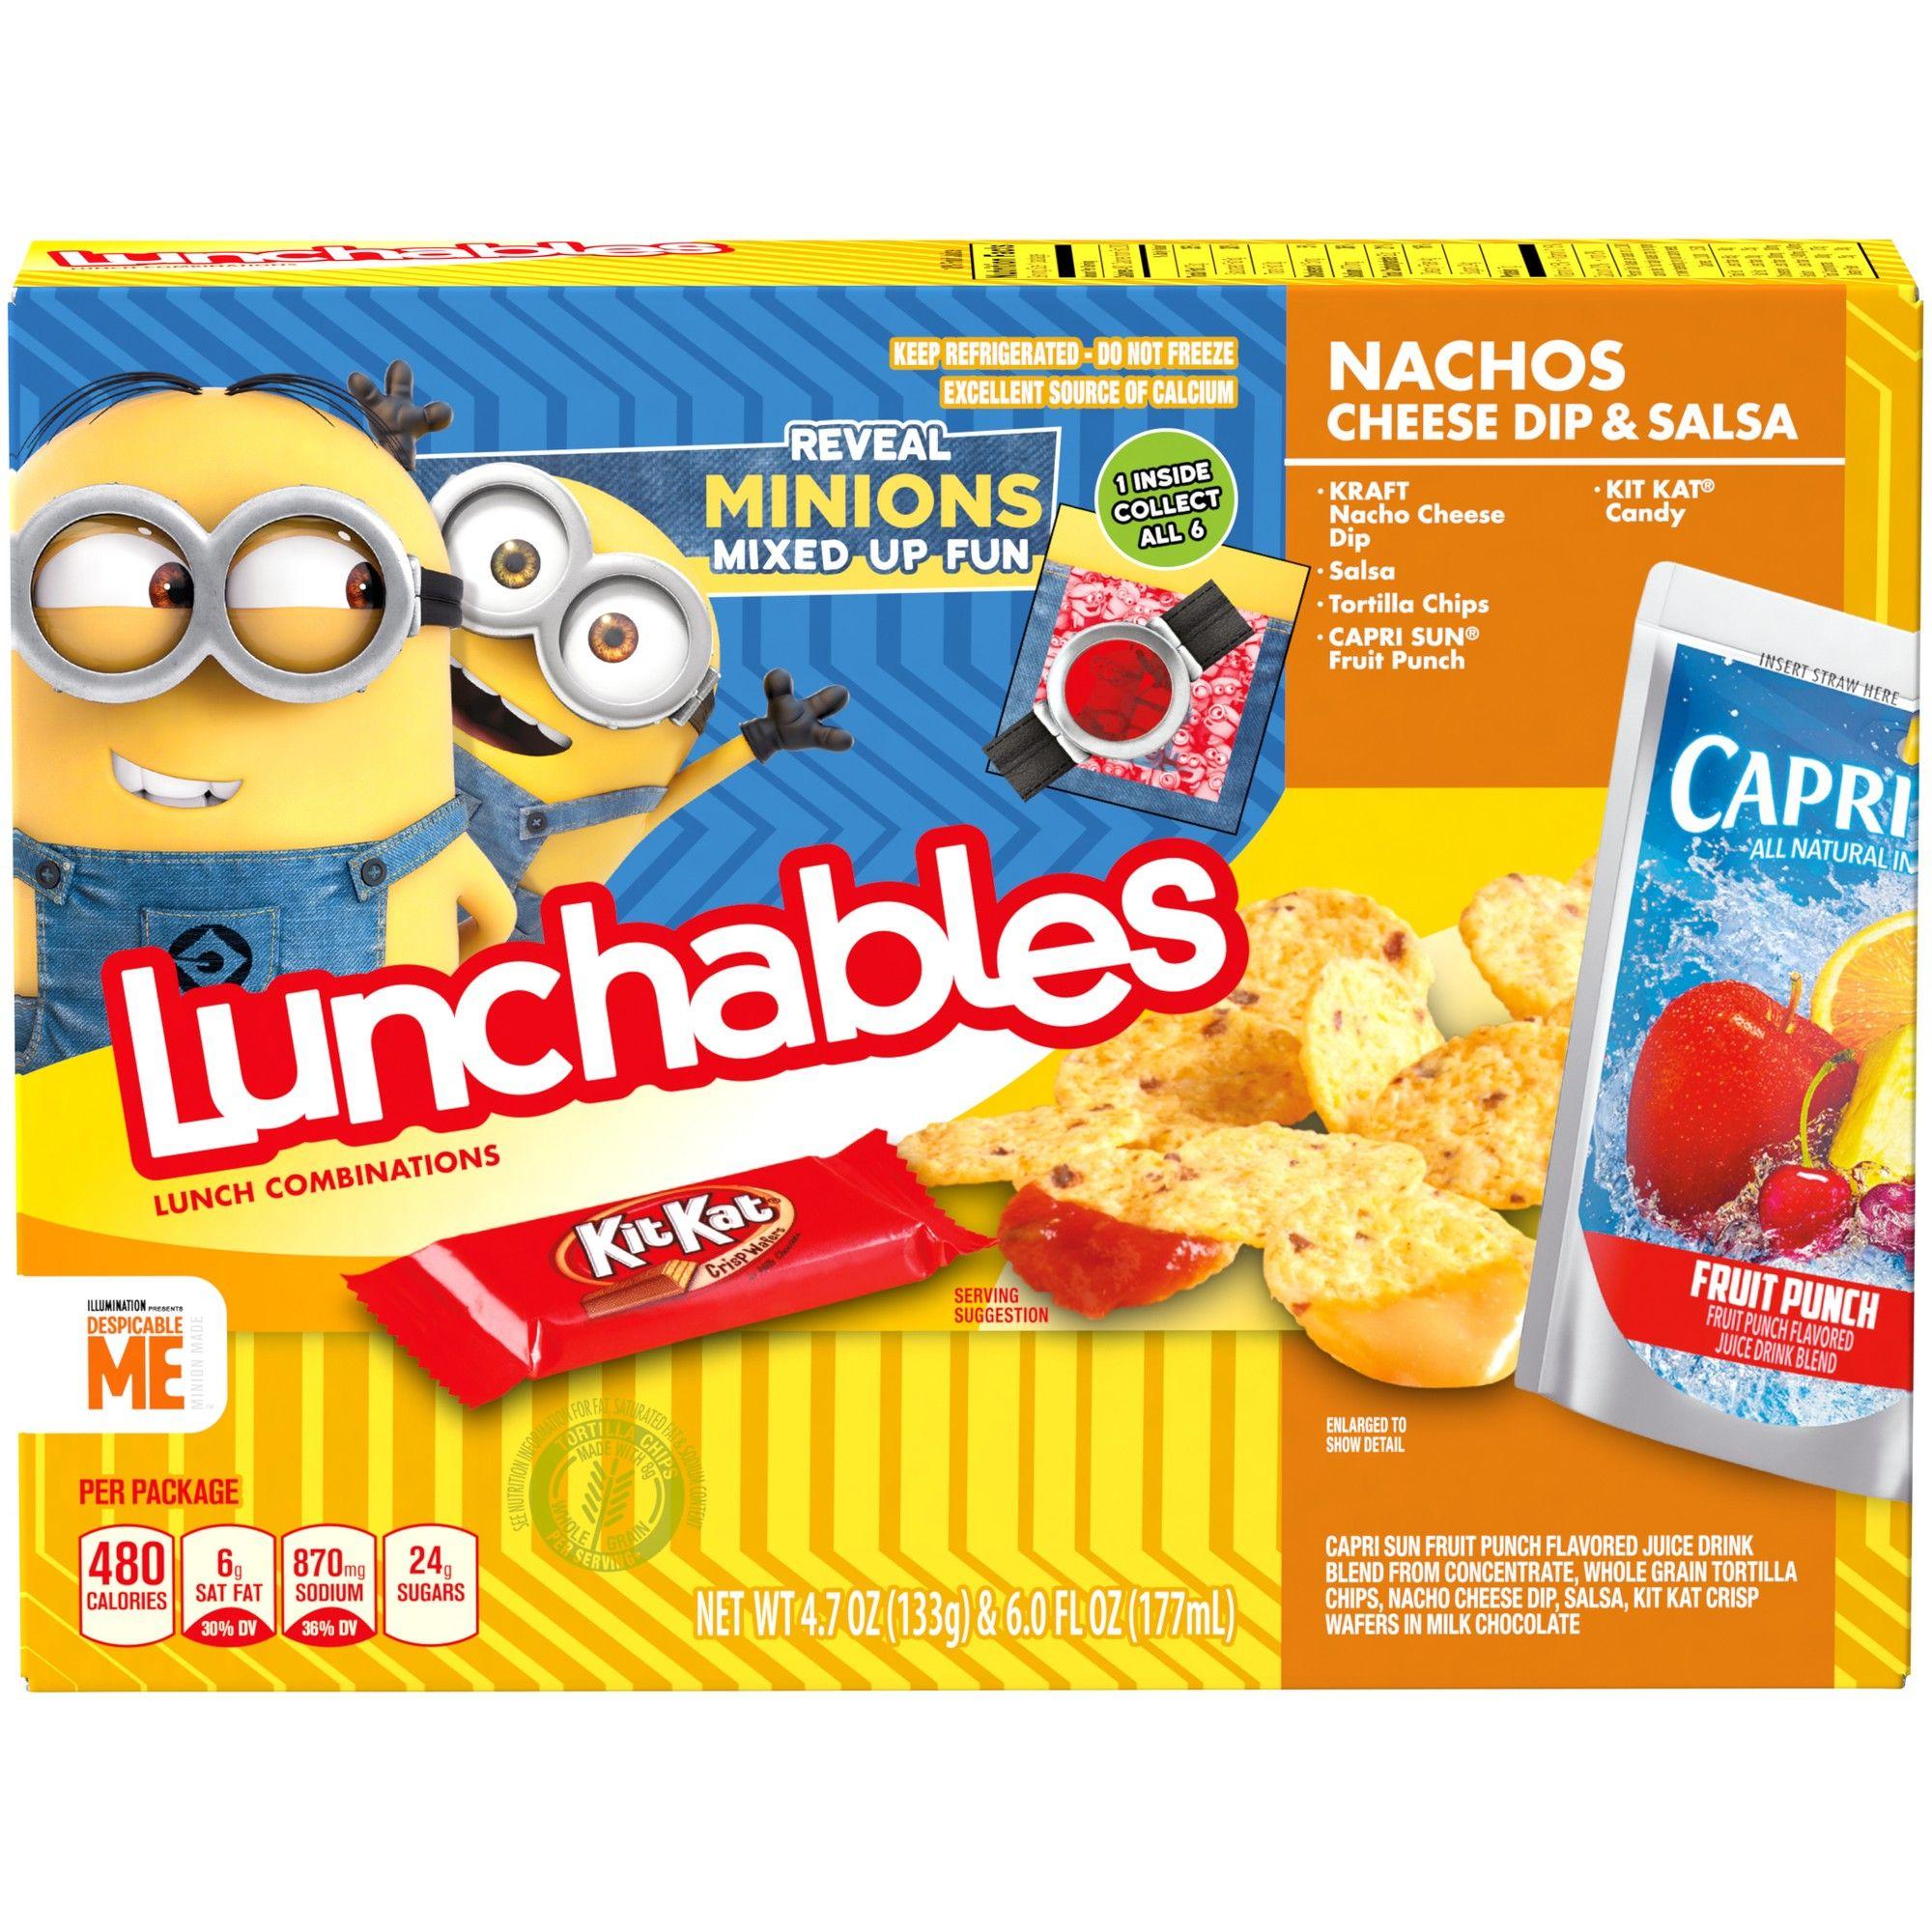 Oscar Mayer Lunchables Nachos With Cheese Dip And Salsa 4 7oz Lunchables Nacho Cheese Cheese Dip